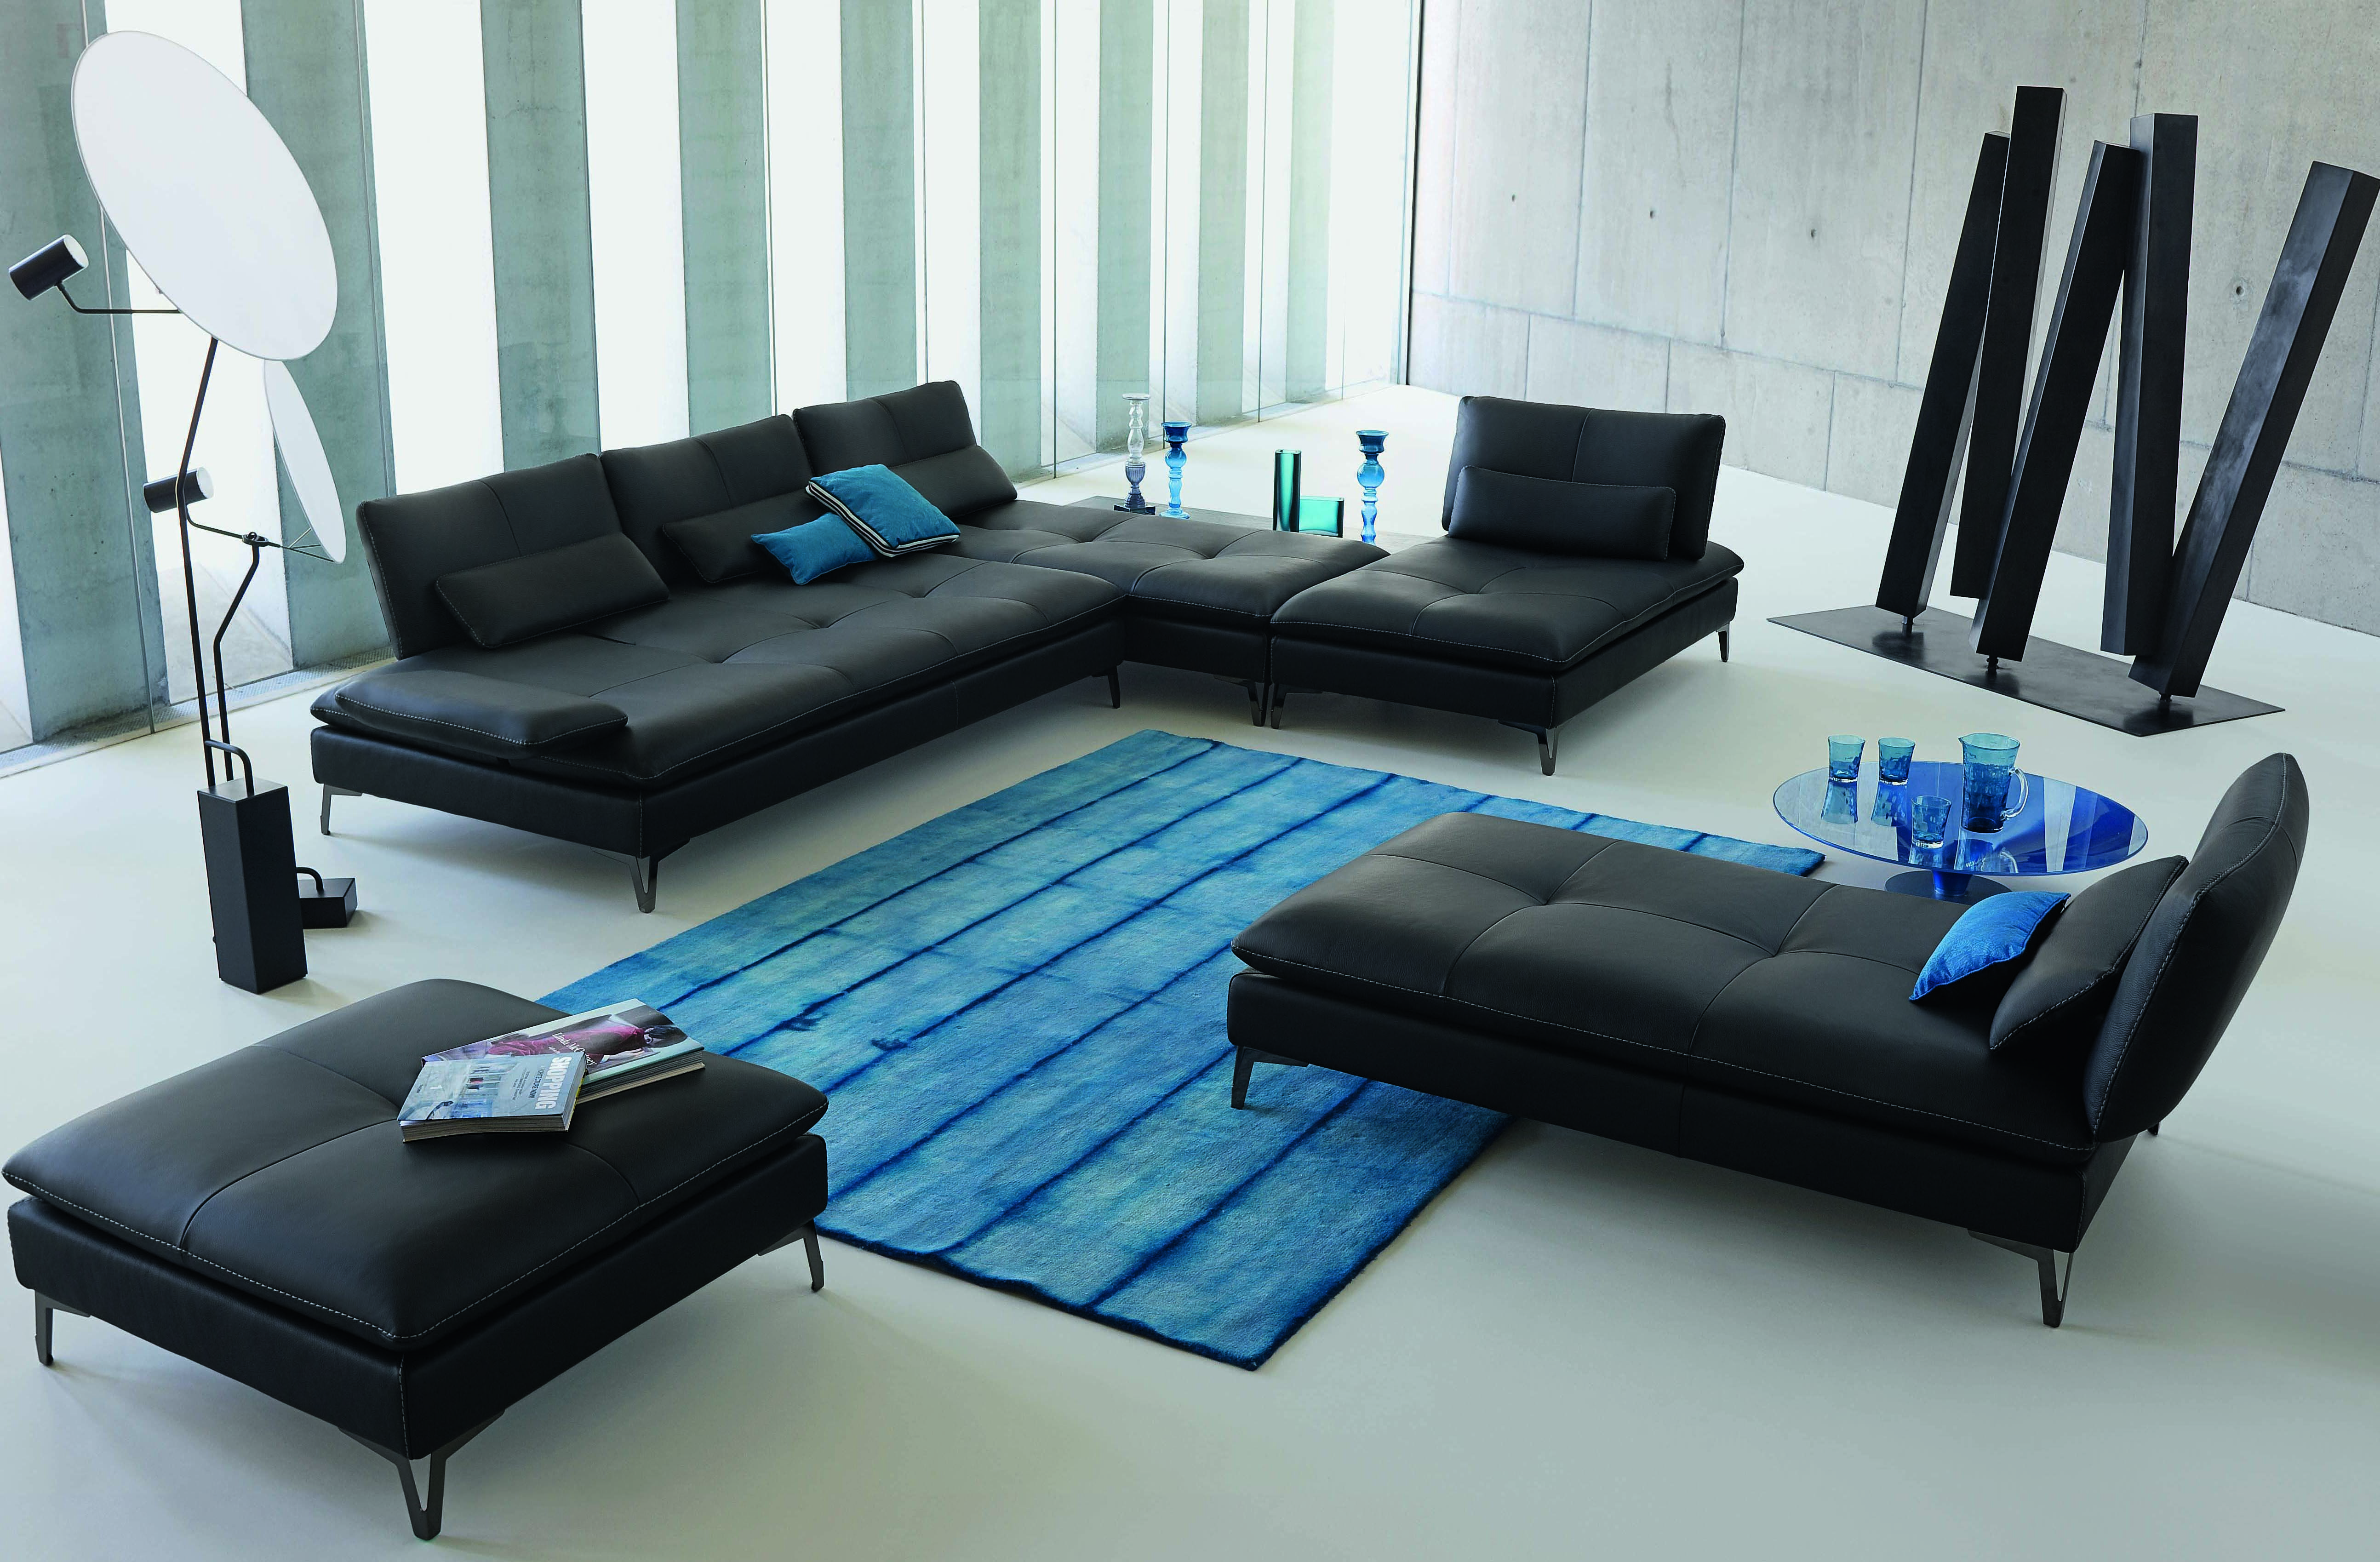 Roche Bobois   SCENARIO Modular Sofa   Design Sacha Lakic #sofau2026